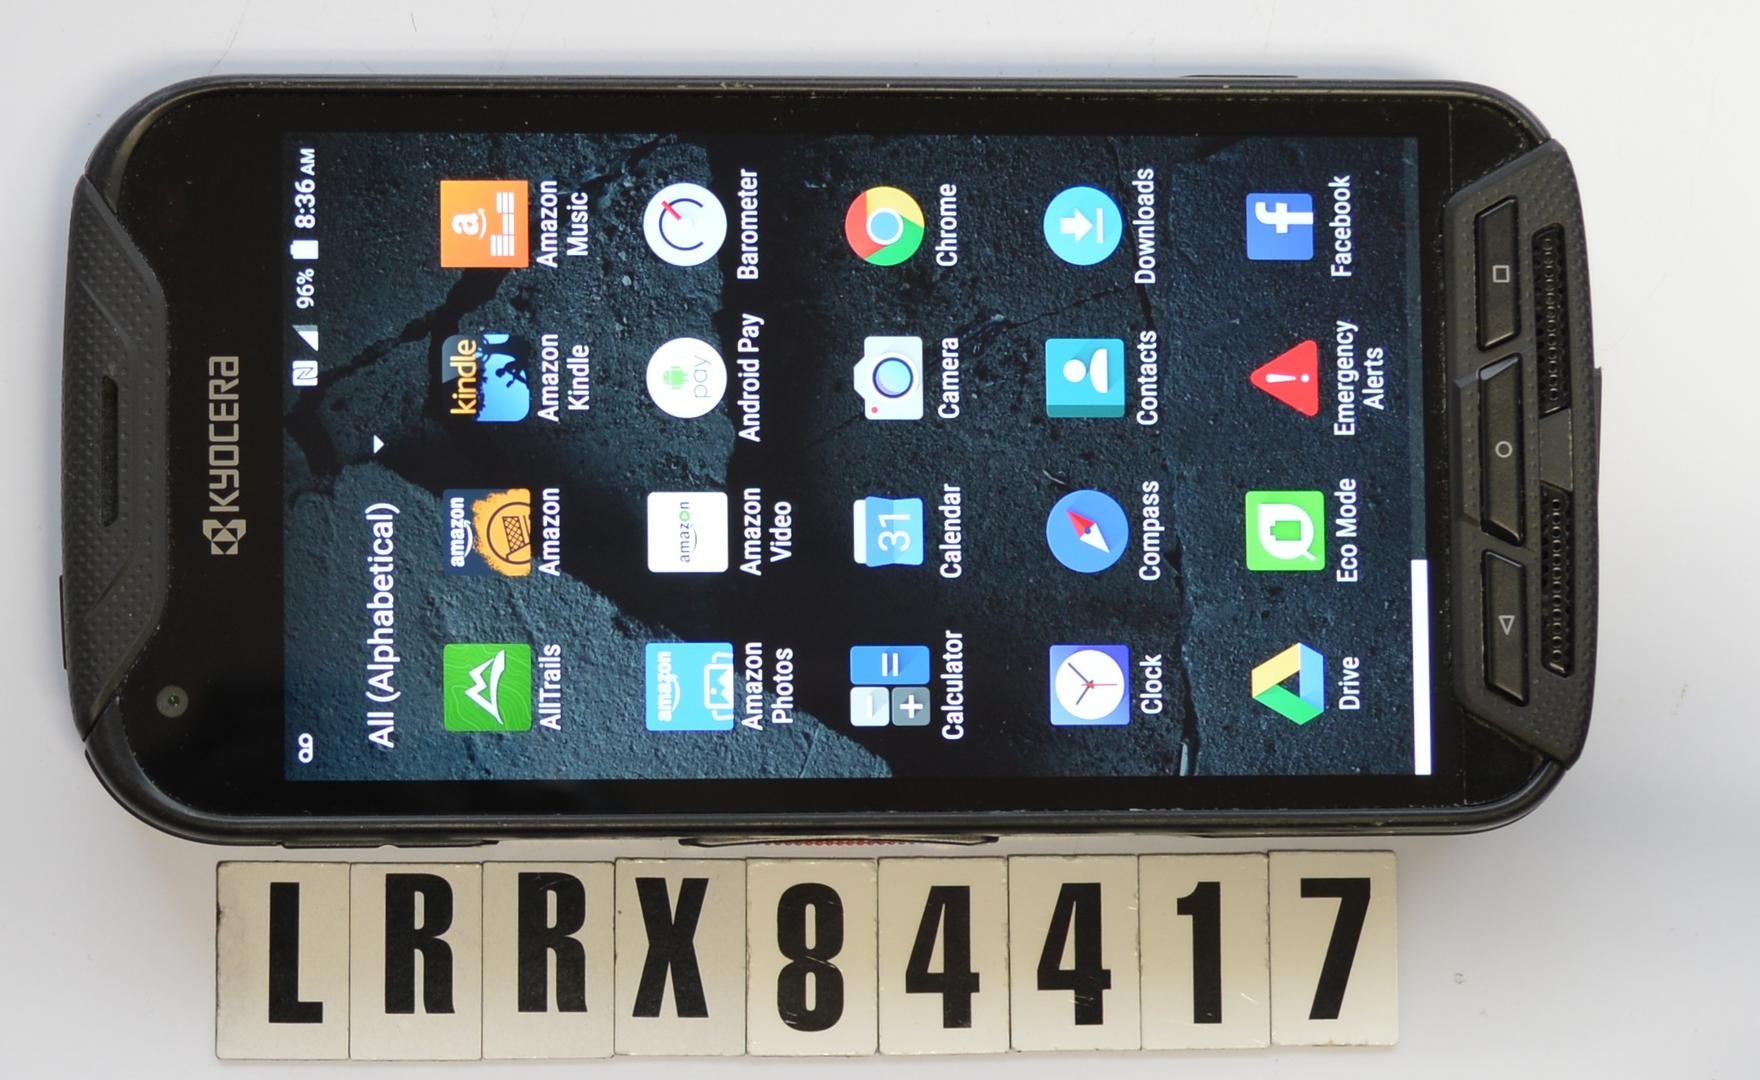 Kyocera DuraForce Pro (Sprint) - Black, 32 GB, 2 GB